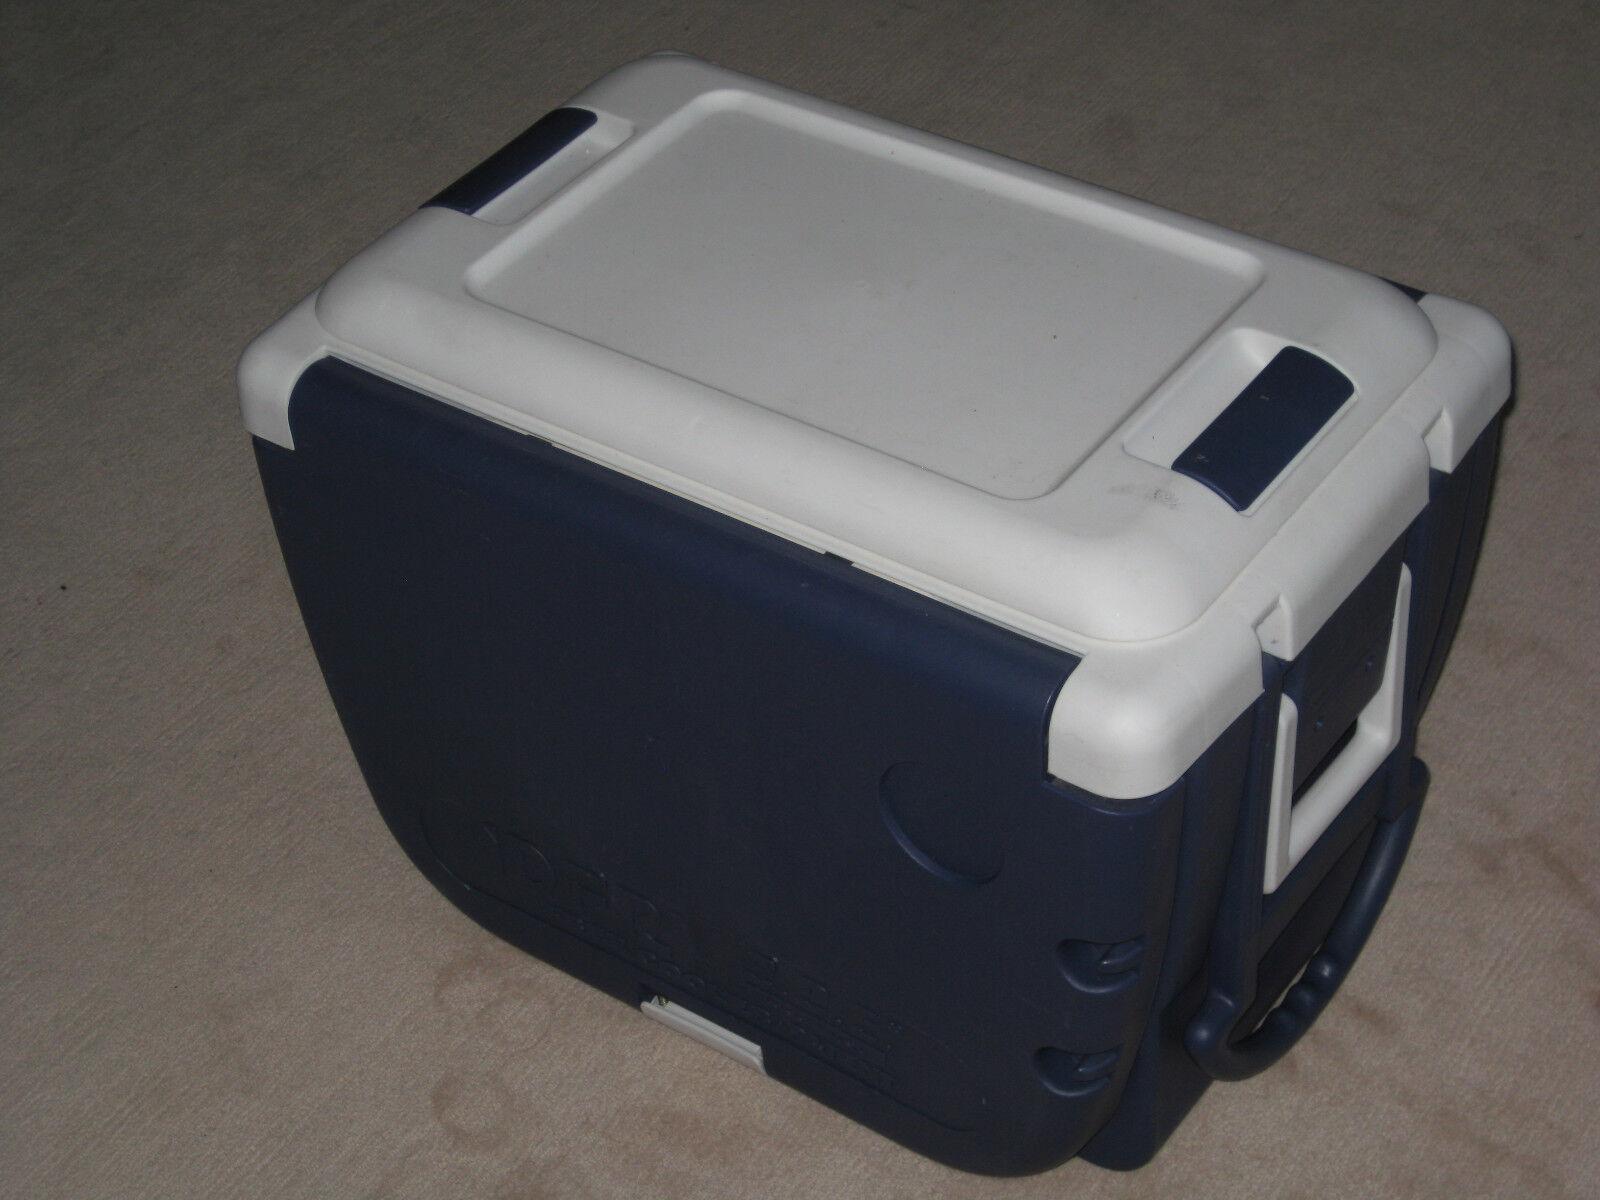 IDFR Free Cooler O.D.E Idea First Camping Box MIT TRAGEGRIFF + RÄDER+ Stühle 30L